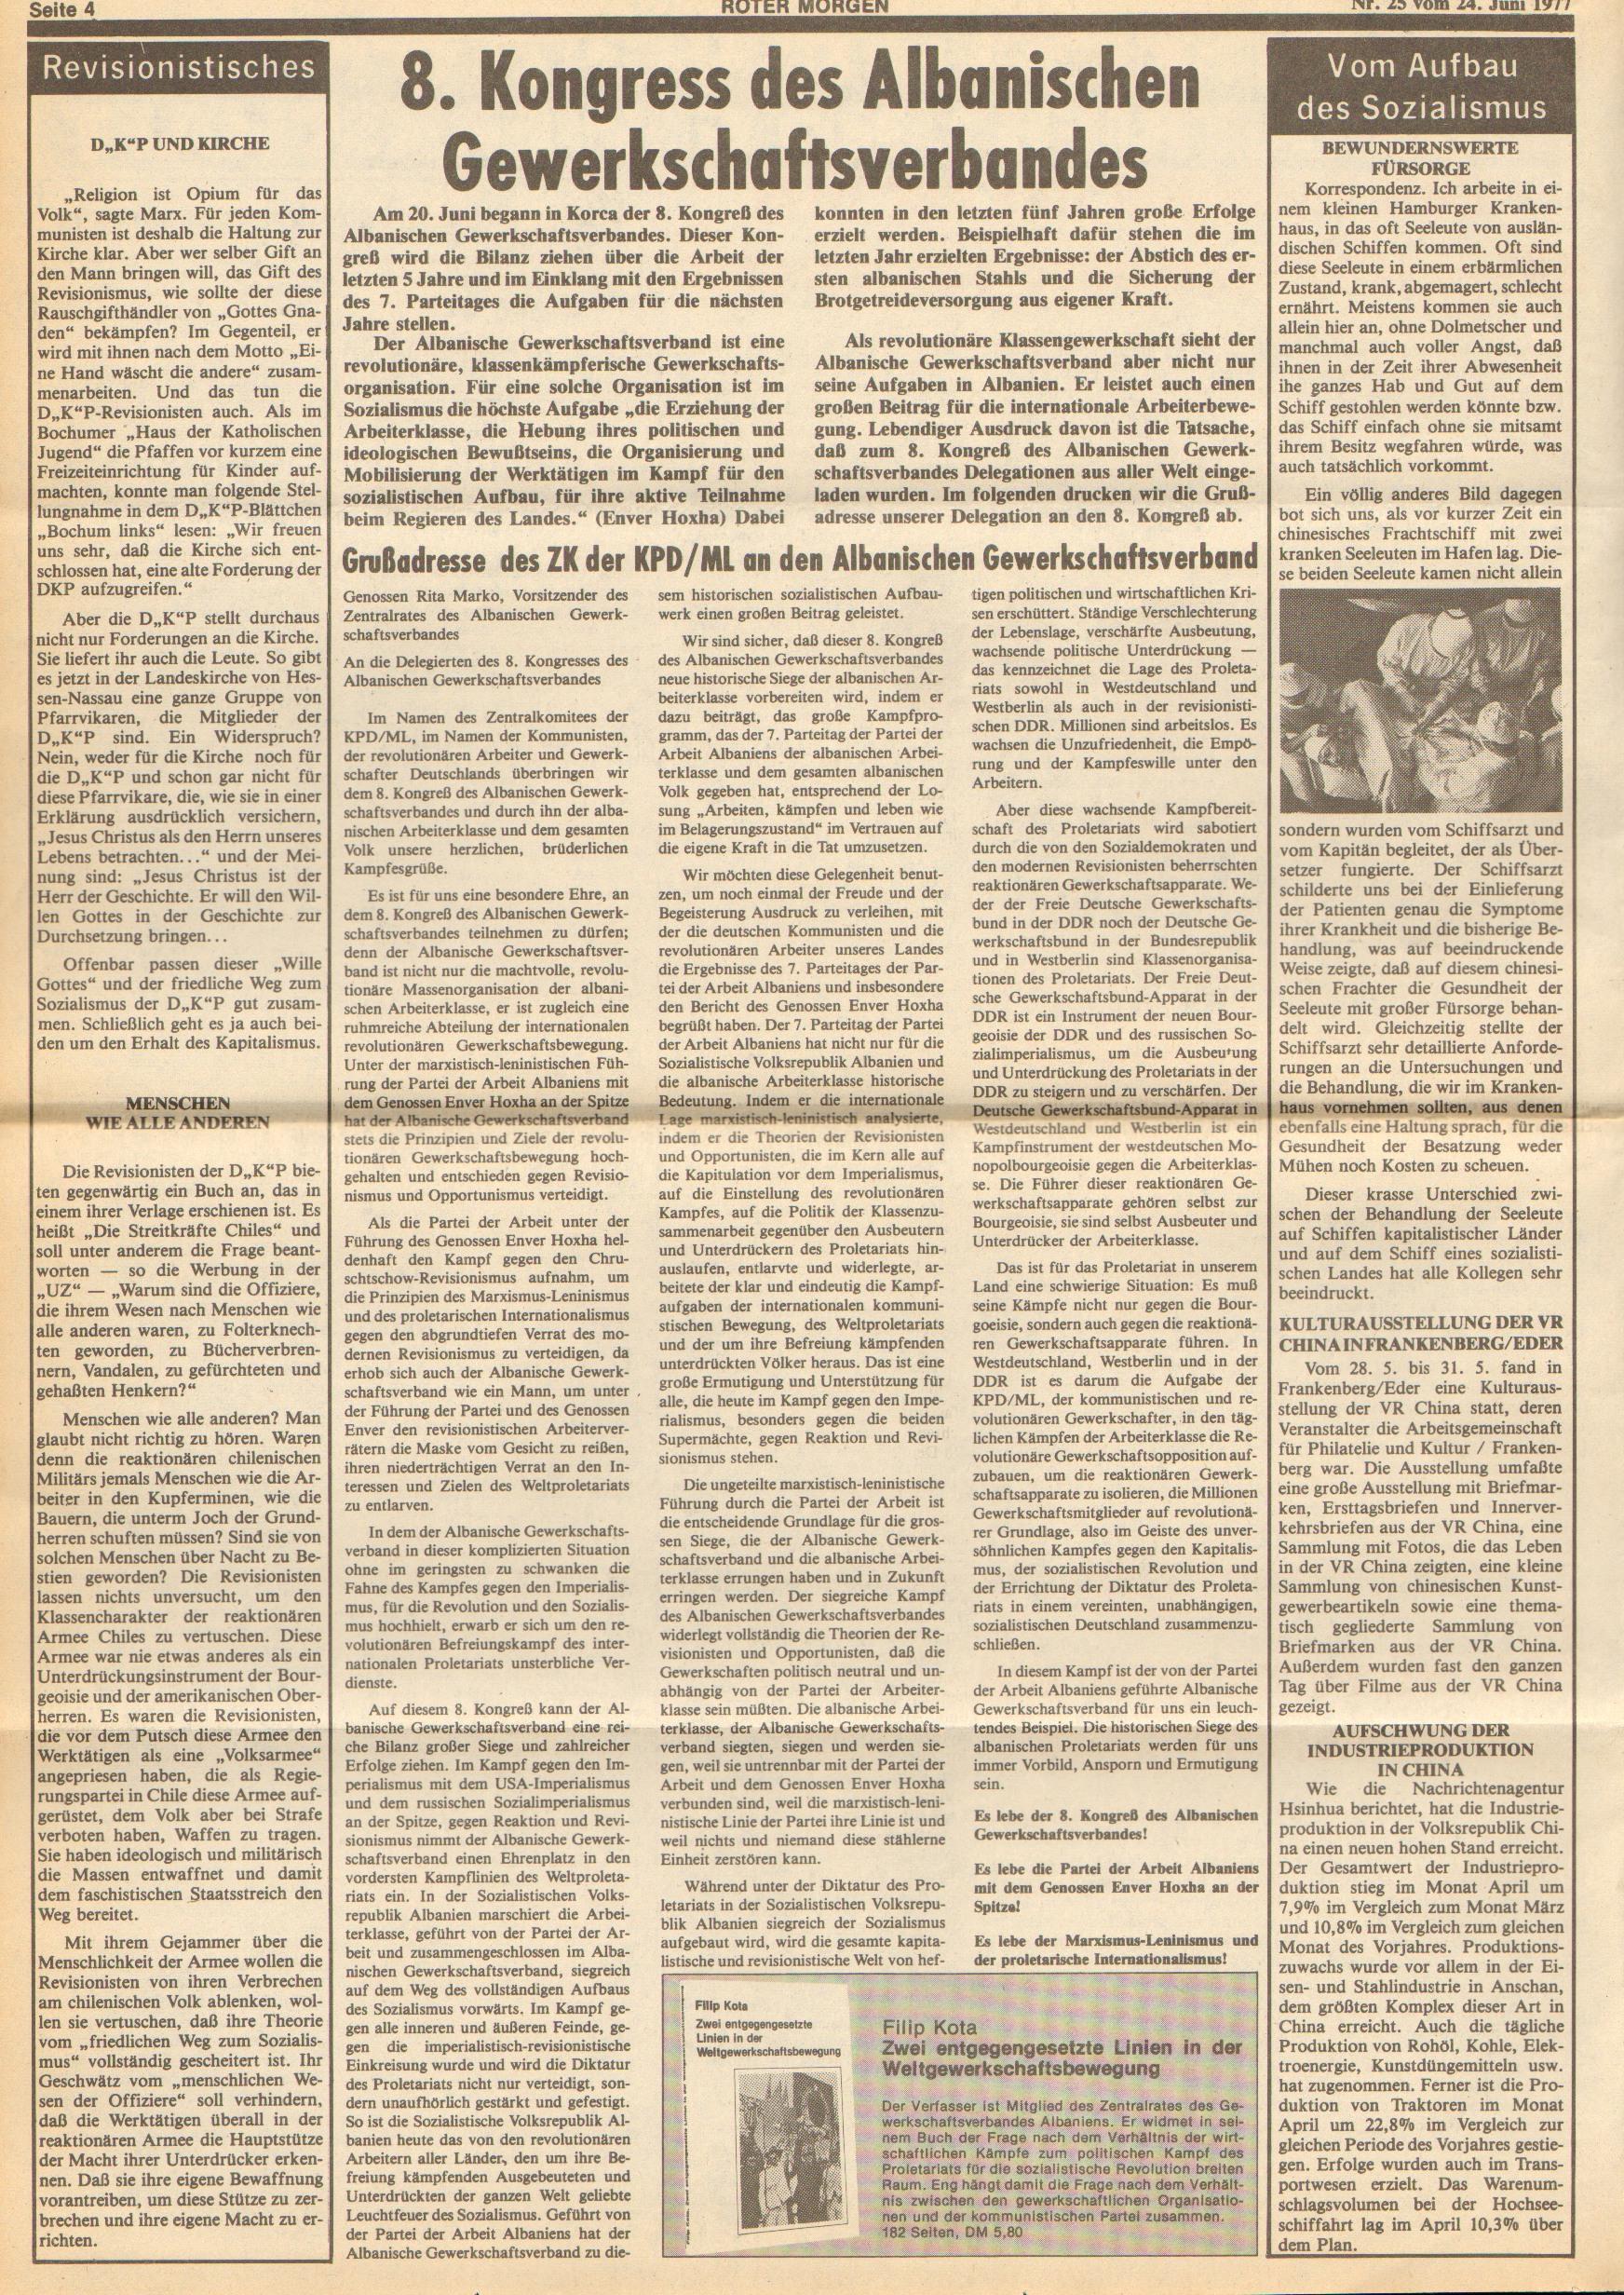 Roter Morgen, 11. Jg., 24. Juni 1977, Nr. 25, Seite 4